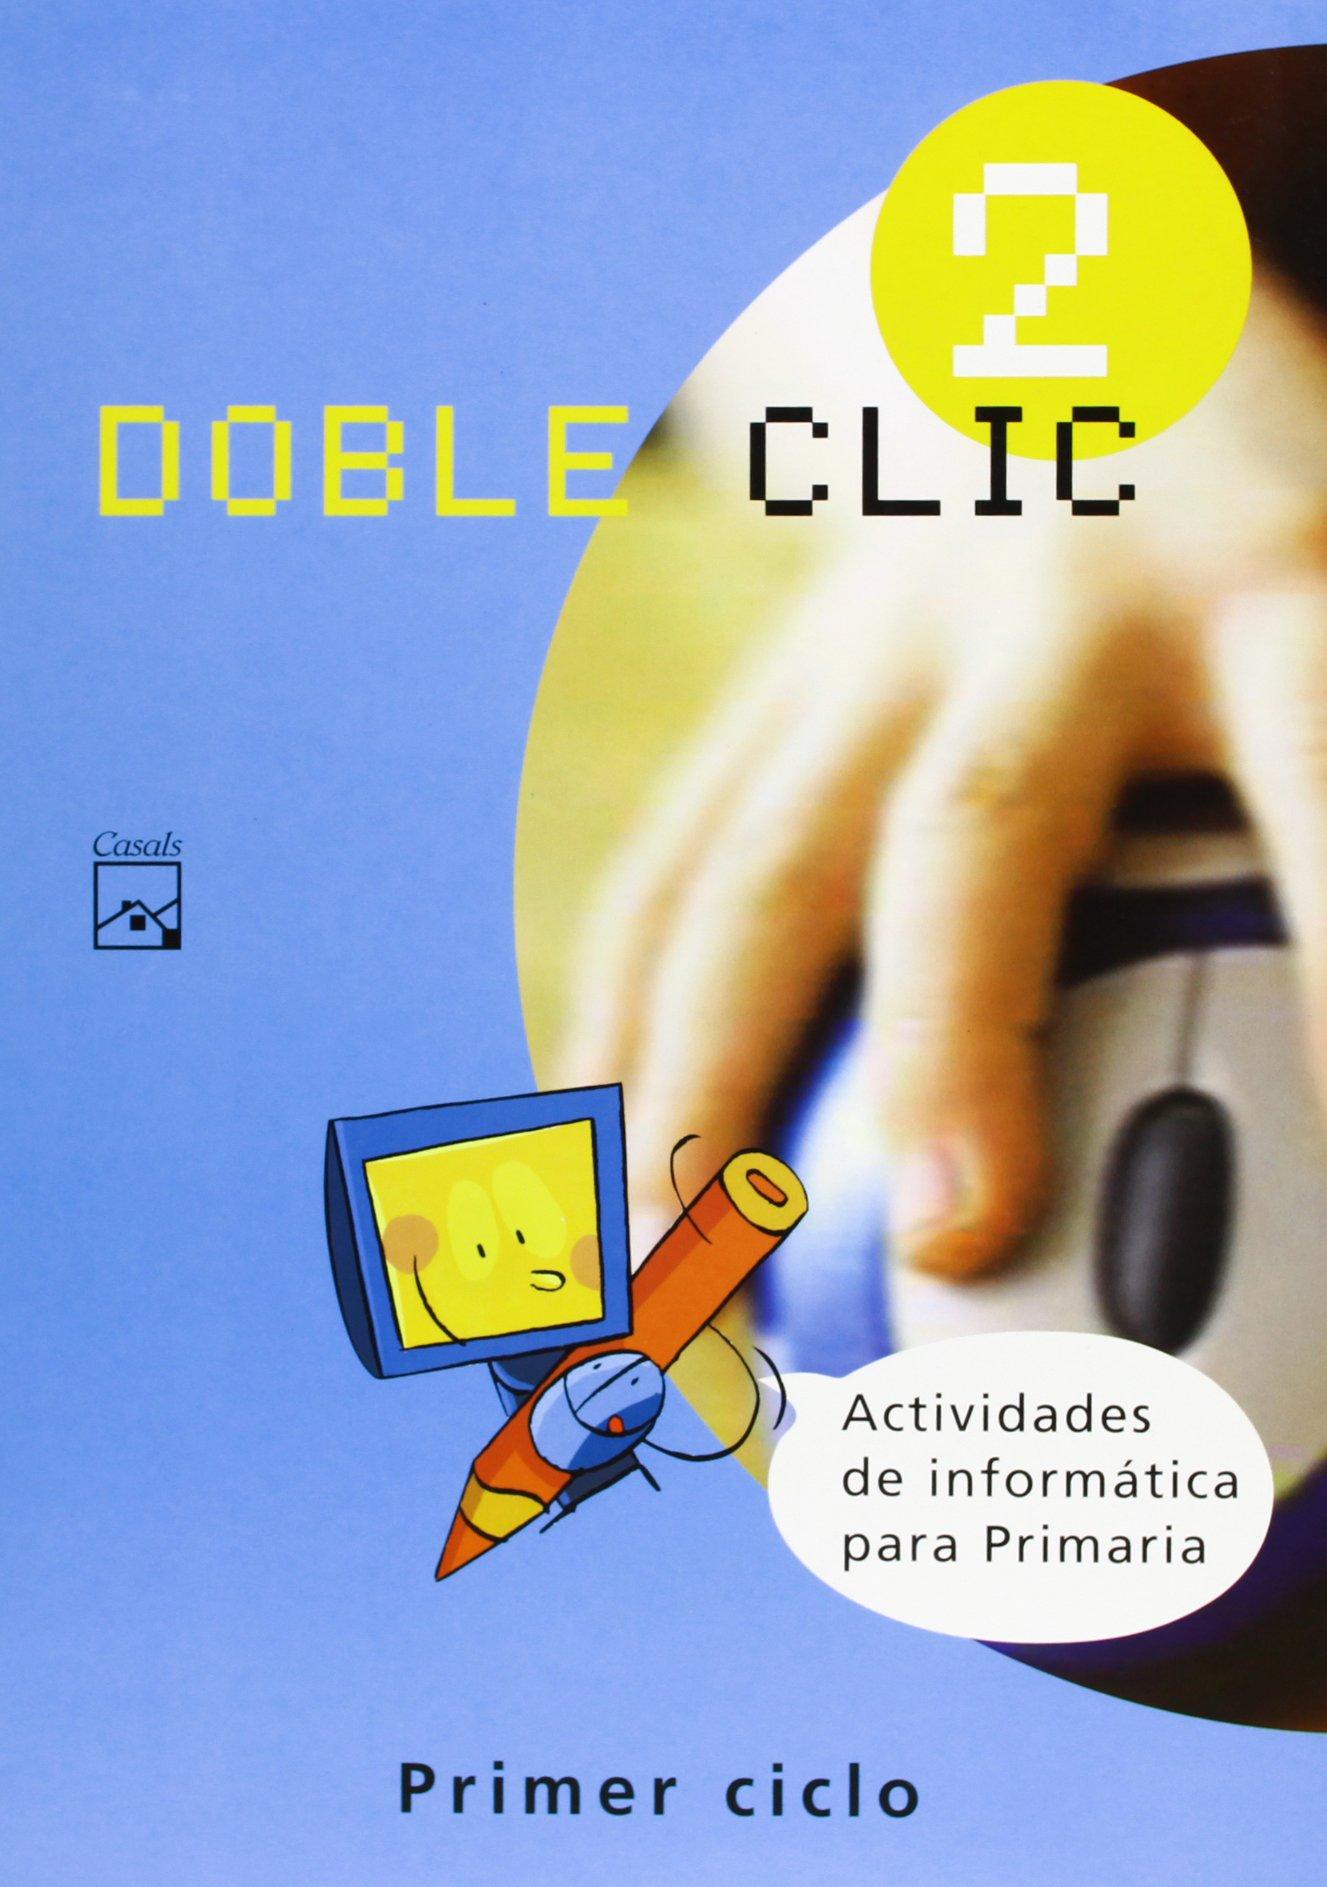 Doble Clic 2. Actividades de inform�tica para Primaria (Spanish) Pamphlet